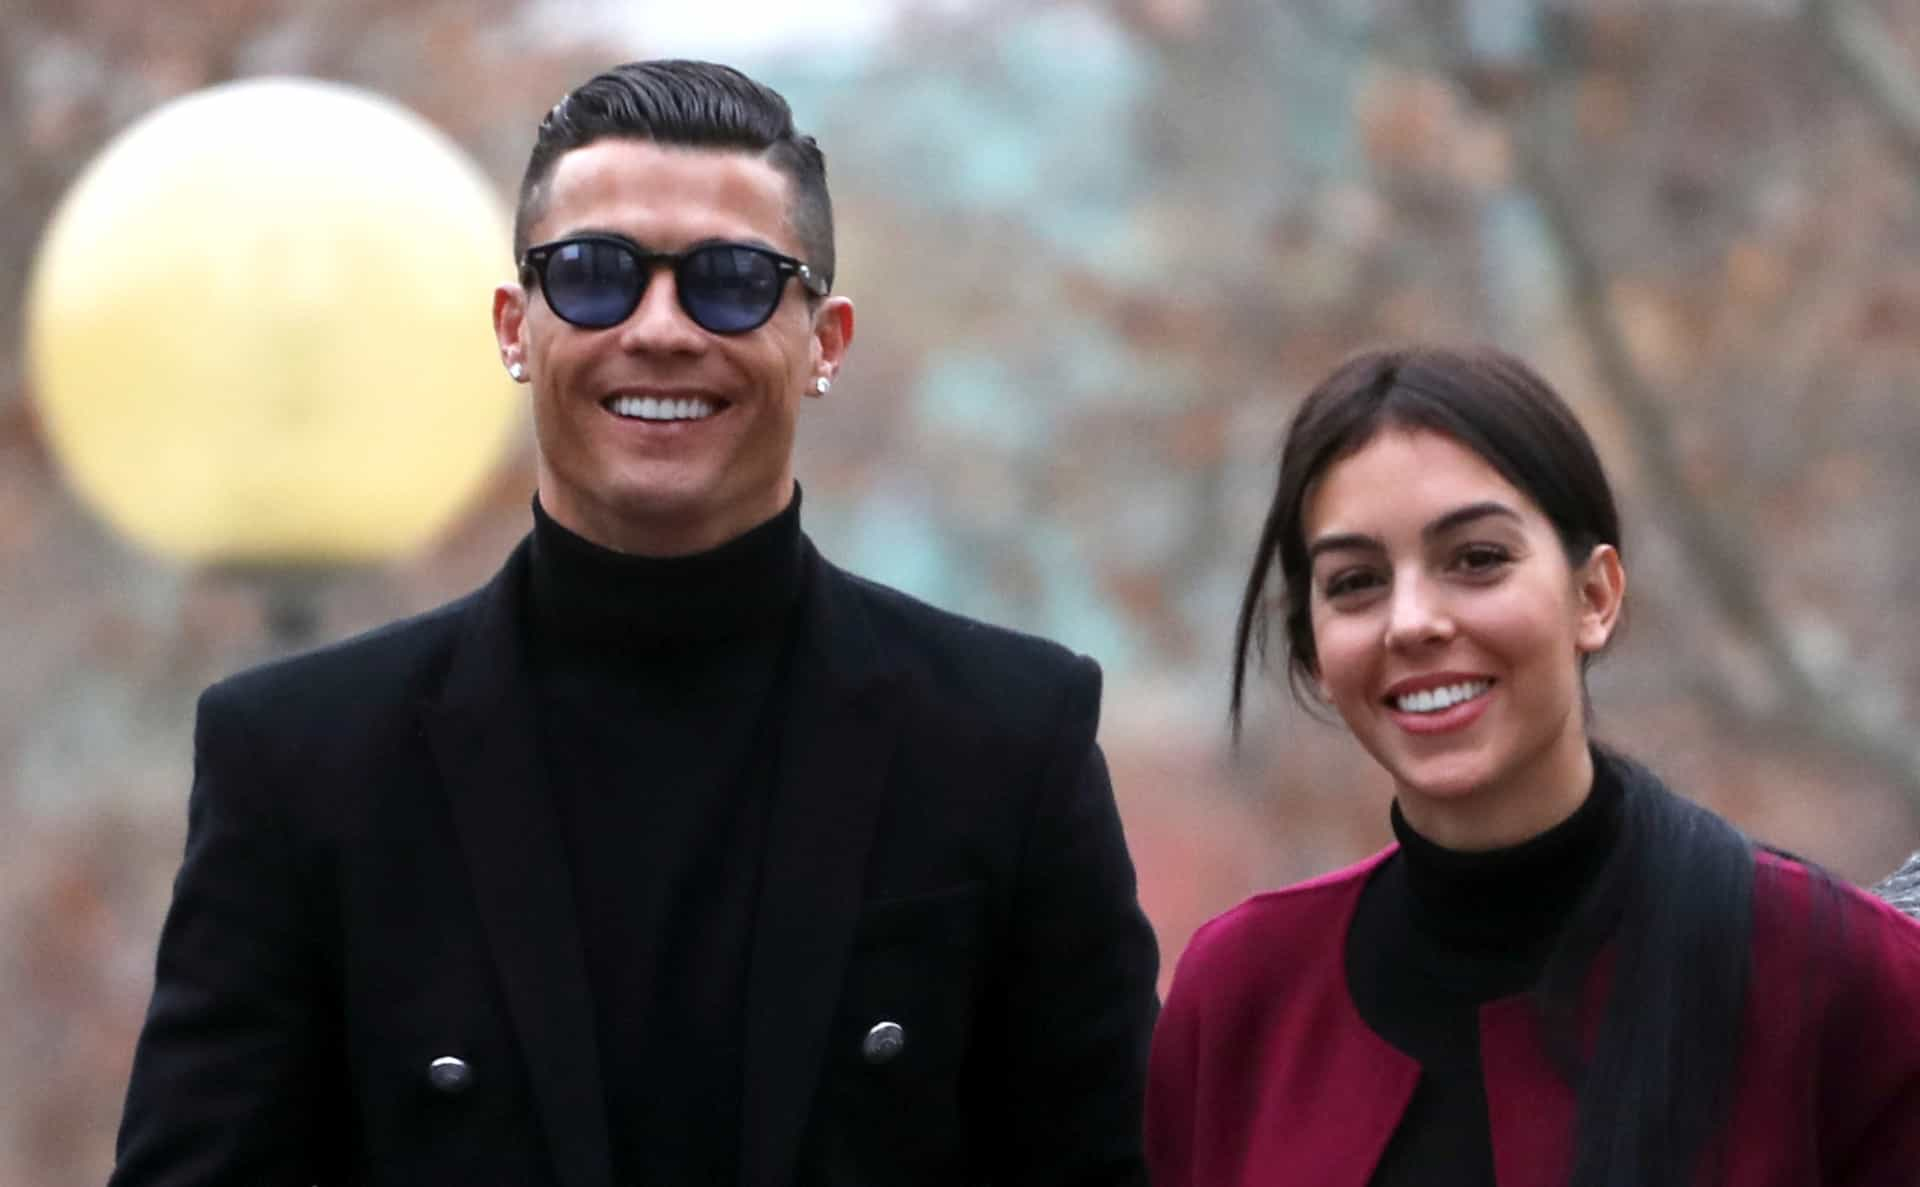 Vídeo: Cristiano Ronaldo recebe tratamento de Georgina Rodríguez